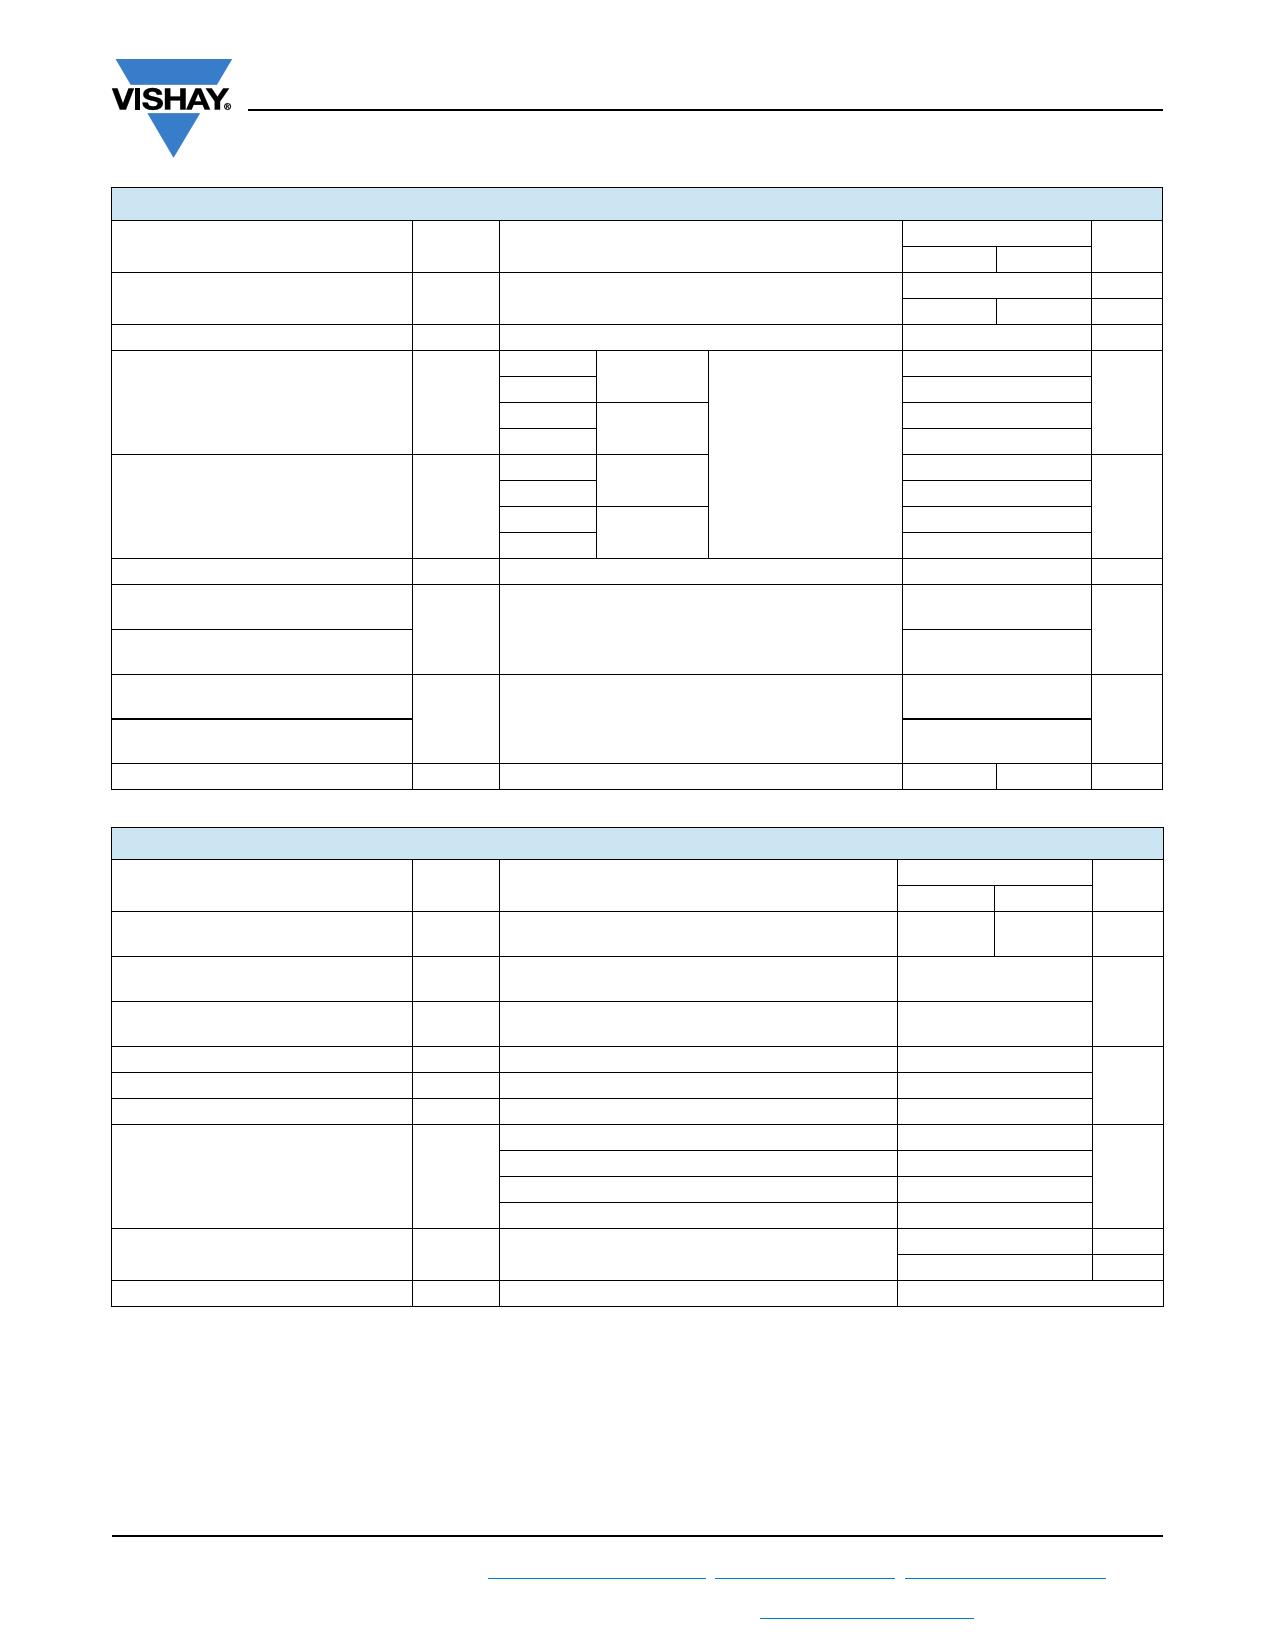 VS-87HFR80 pdf, equivalent, schematic